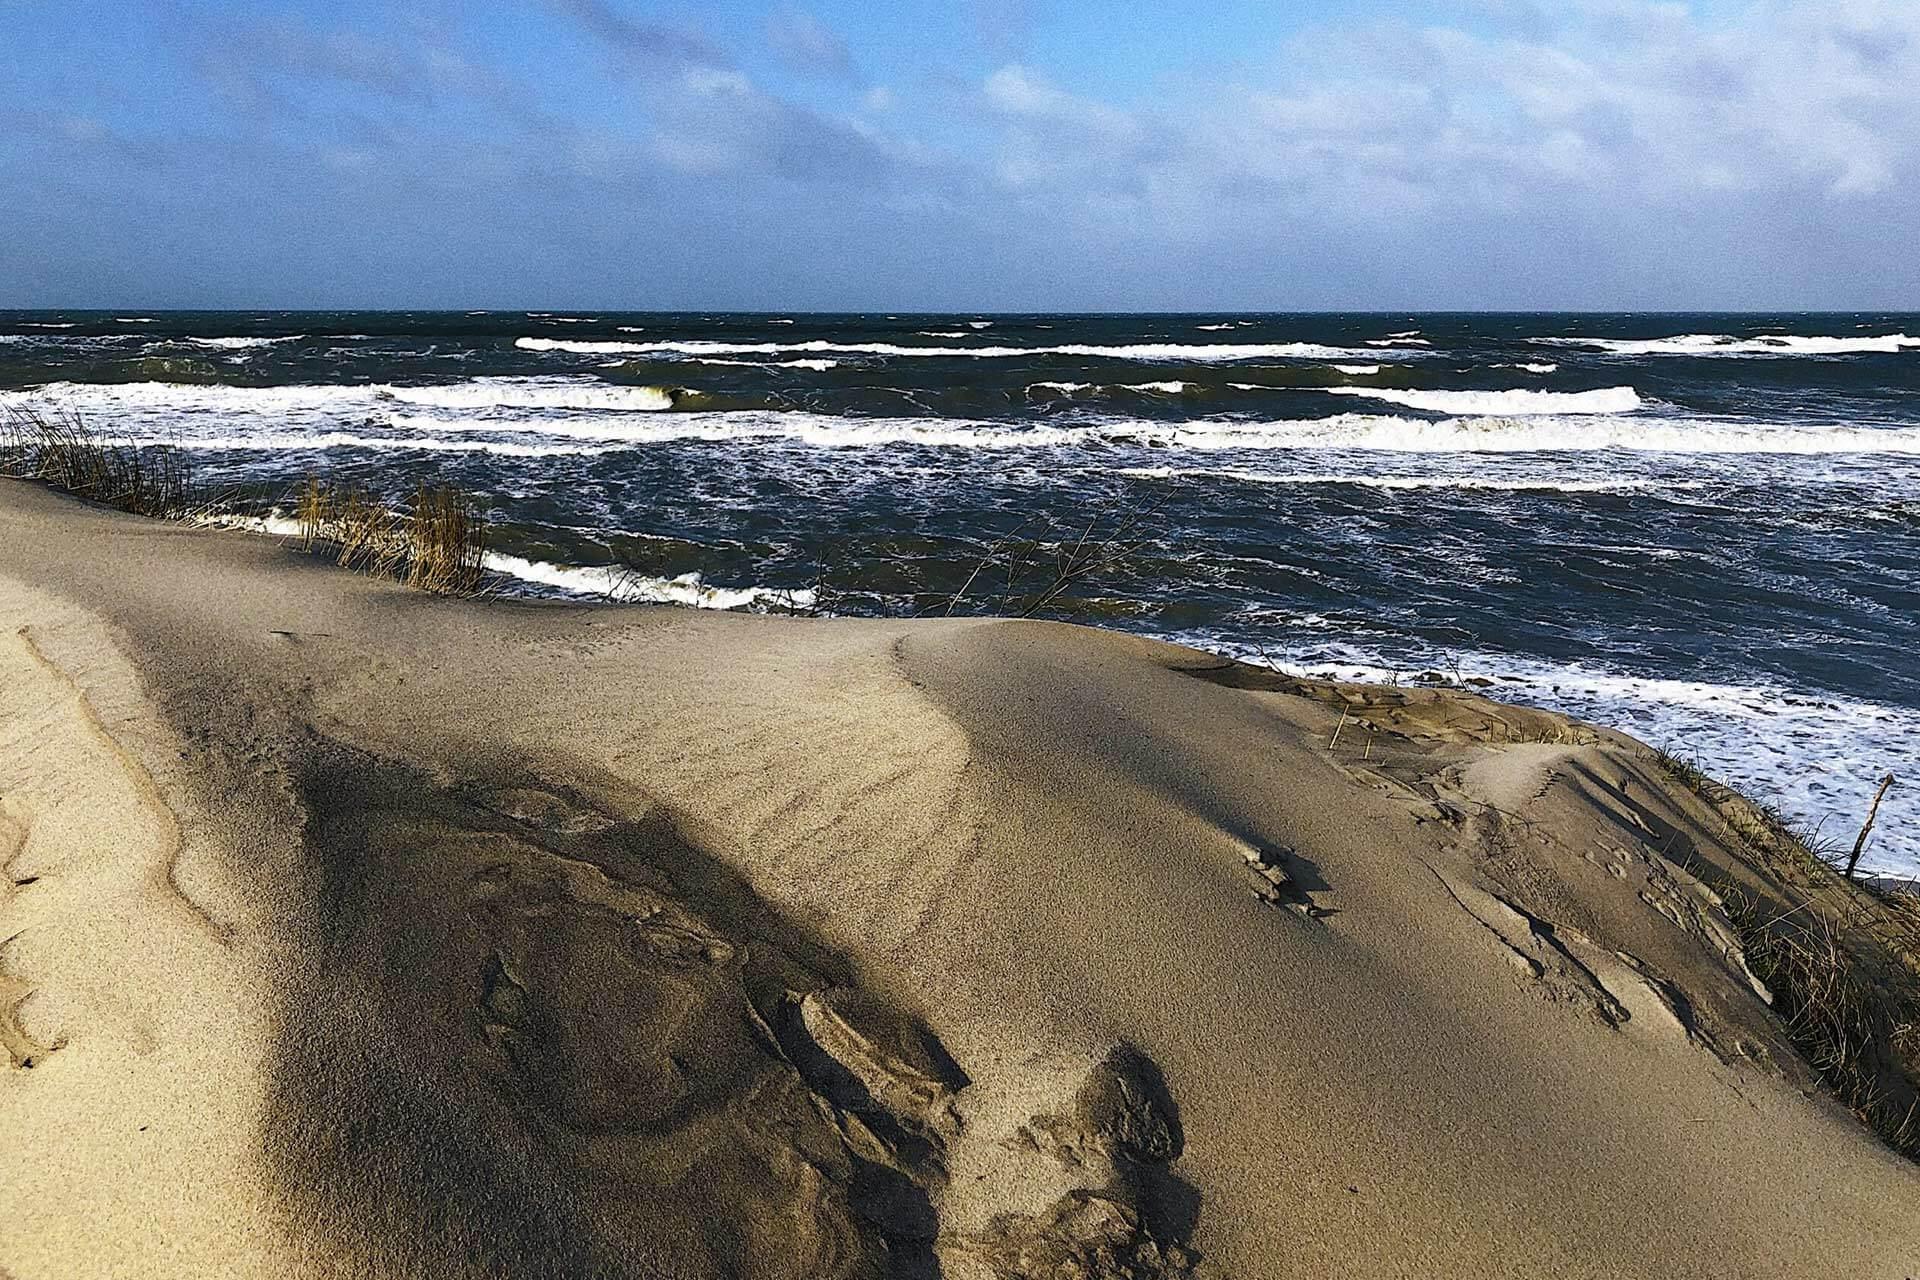 A sandy beach of the Baltic sea, the sand-dune land